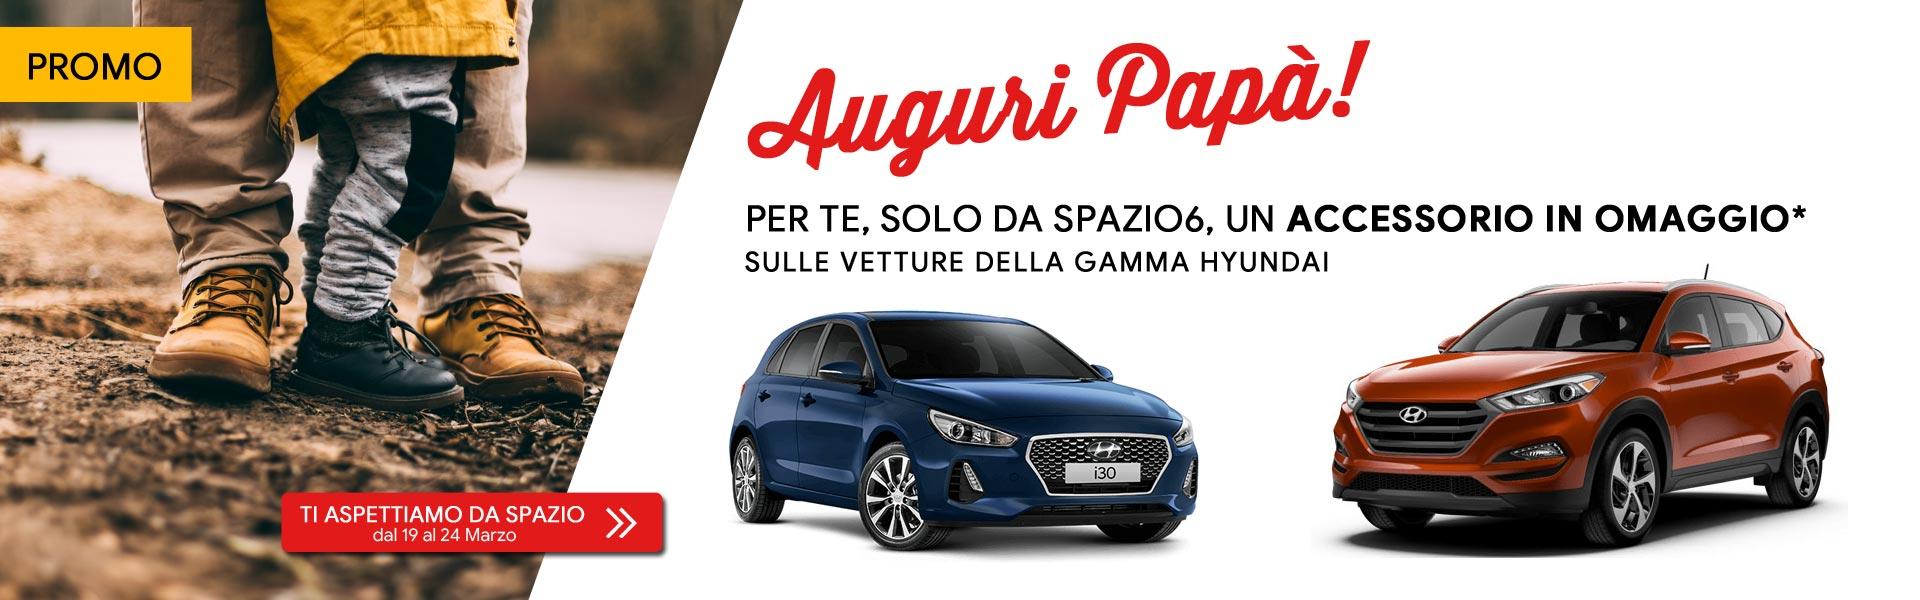 Festa del papà Hyundai